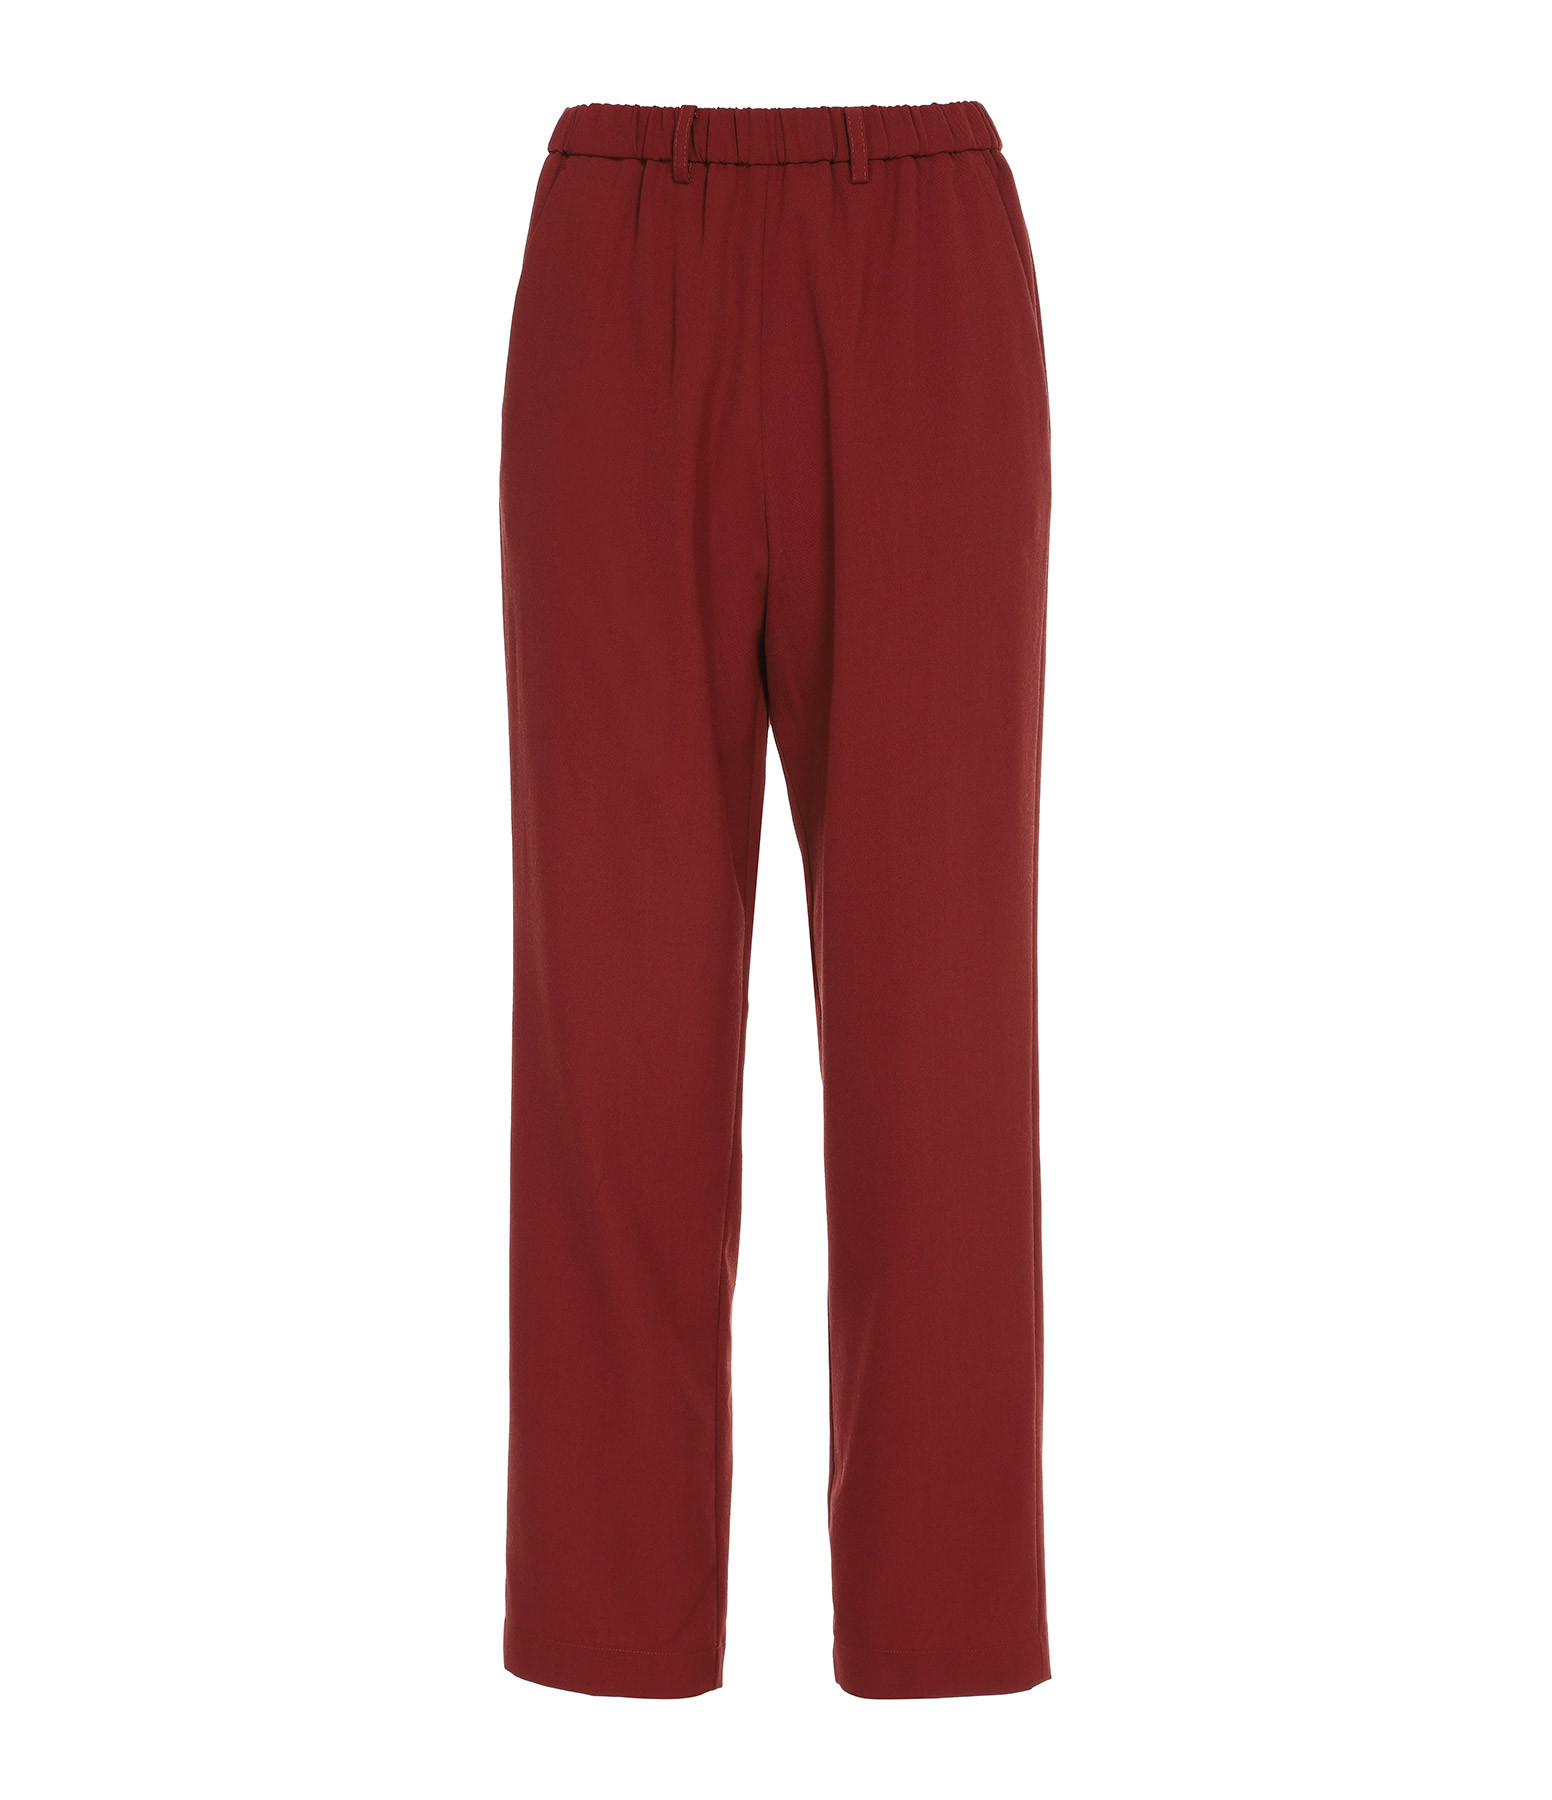 FORTE_FORTE - Pantalon Fluide Rouille